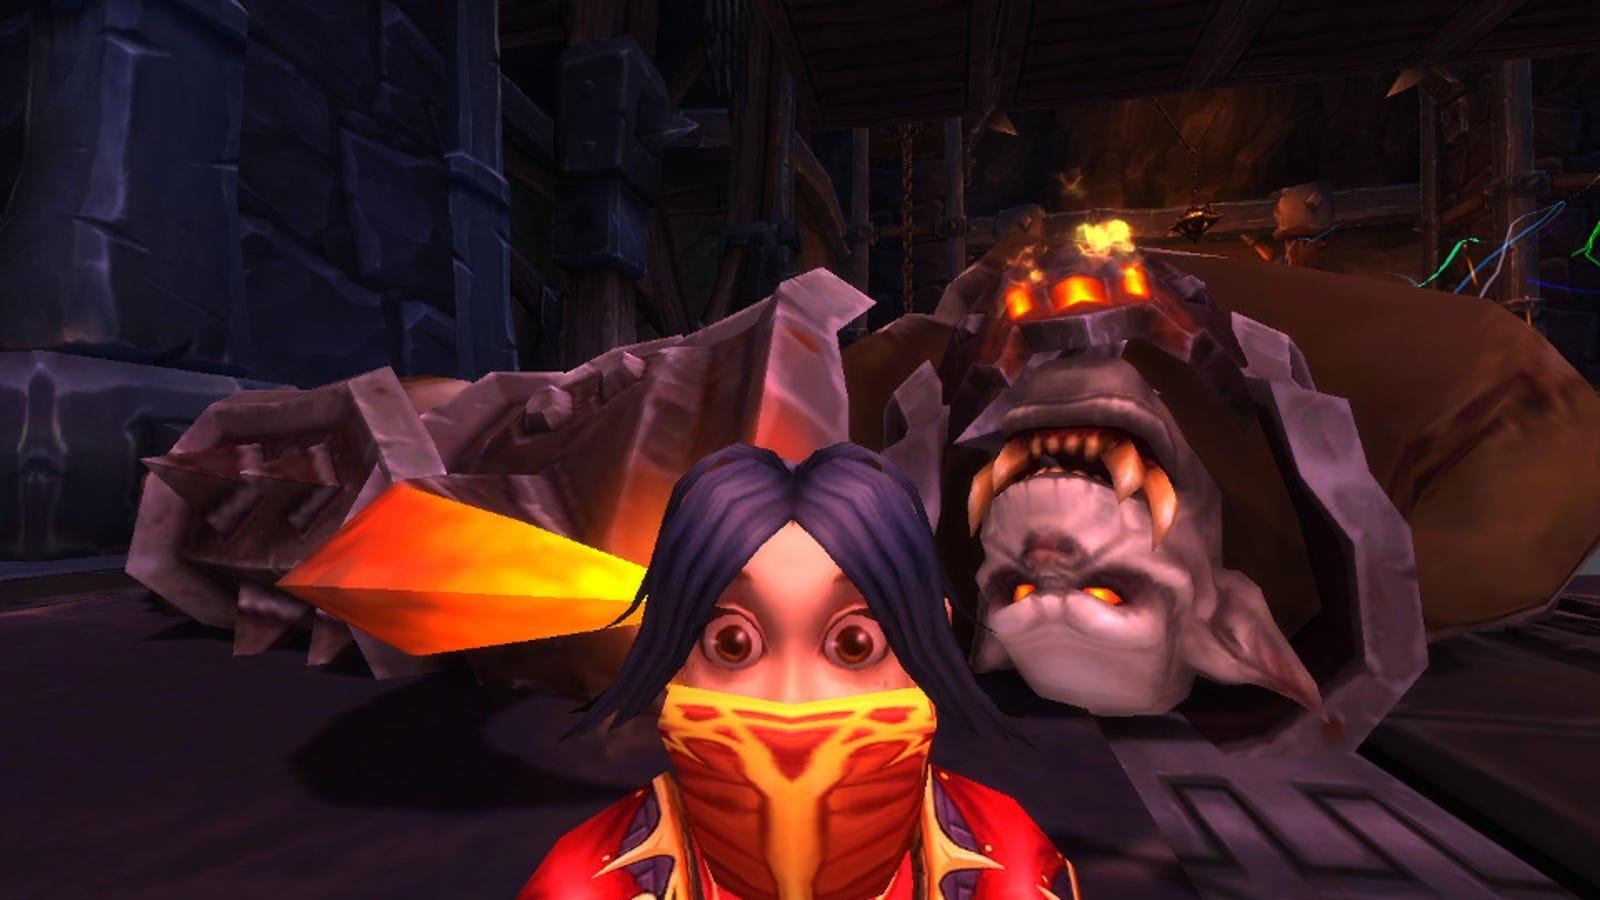 Fifteen Great World of Warcraft Selfies